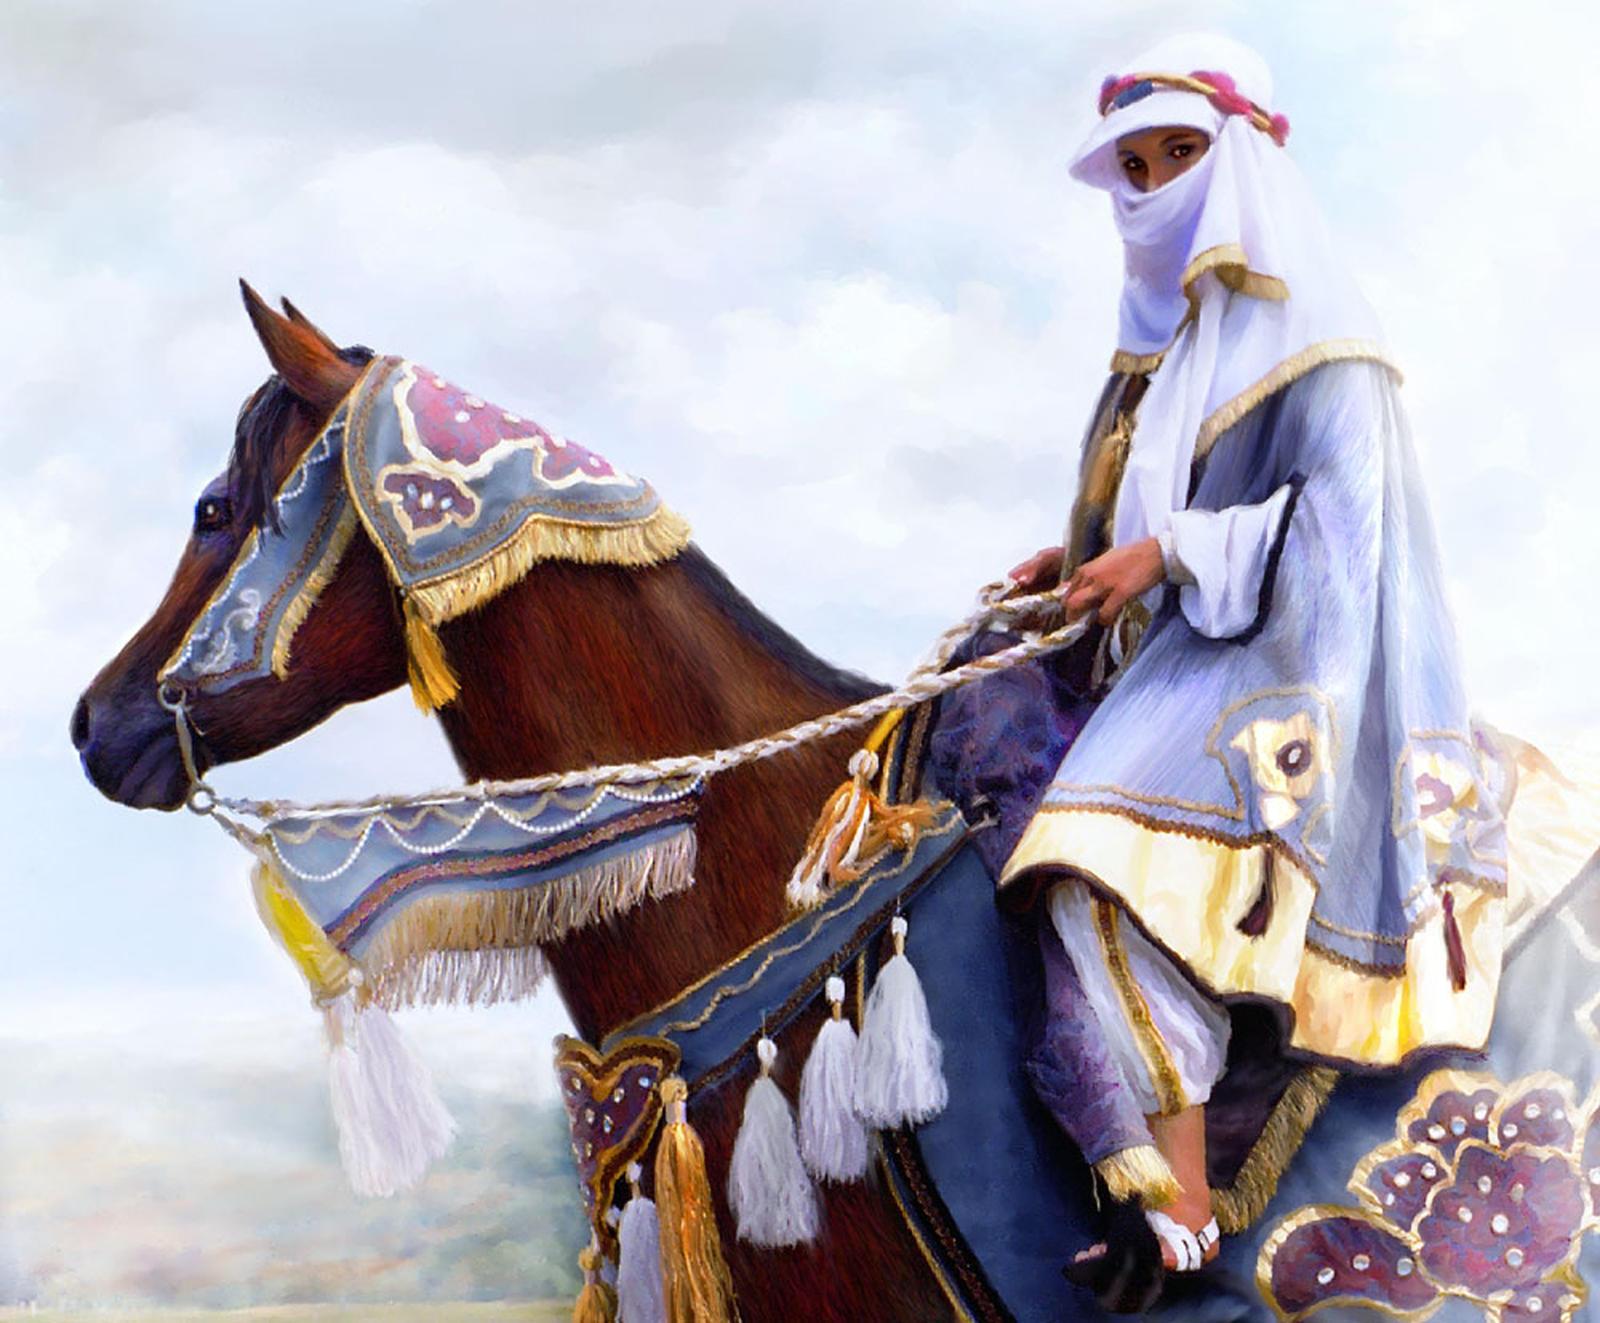 Arabian Desert by larage4peace on DeviantArt